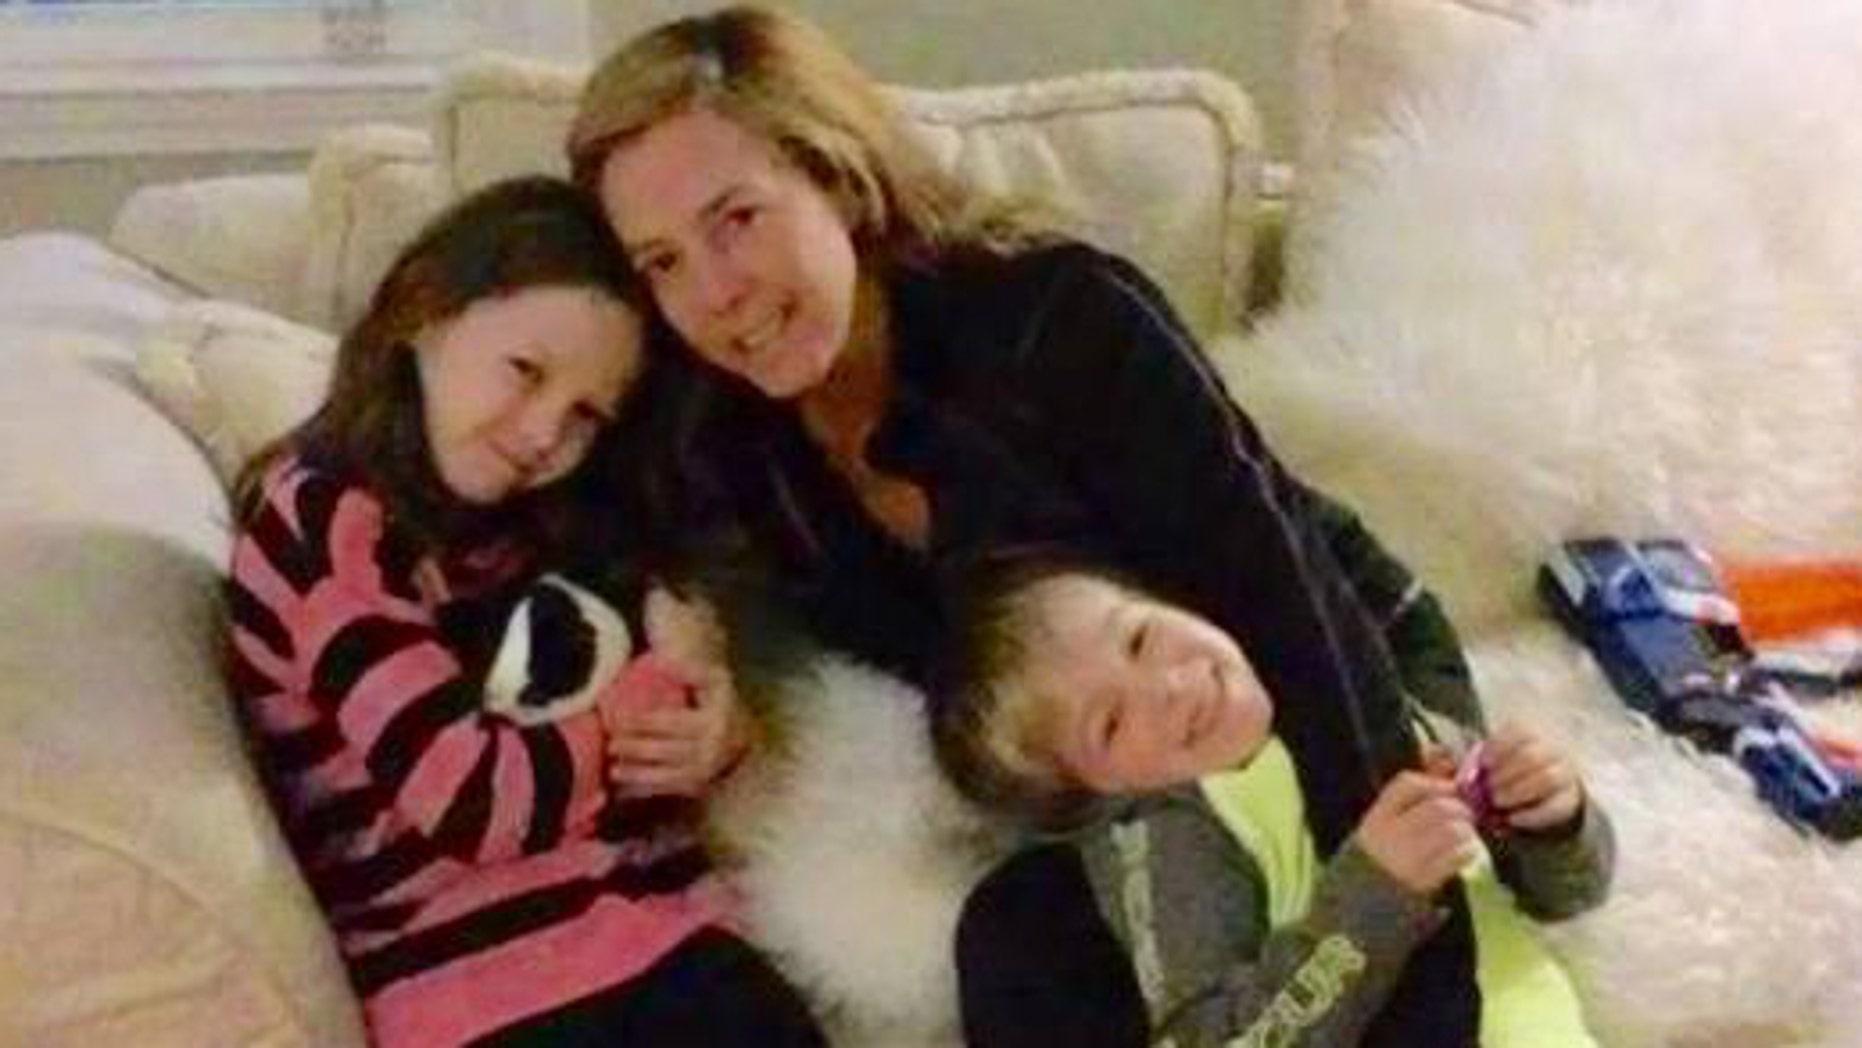 Cops found Valerie McGrath, center, and her children, Eden and Steven, safe on Monday.